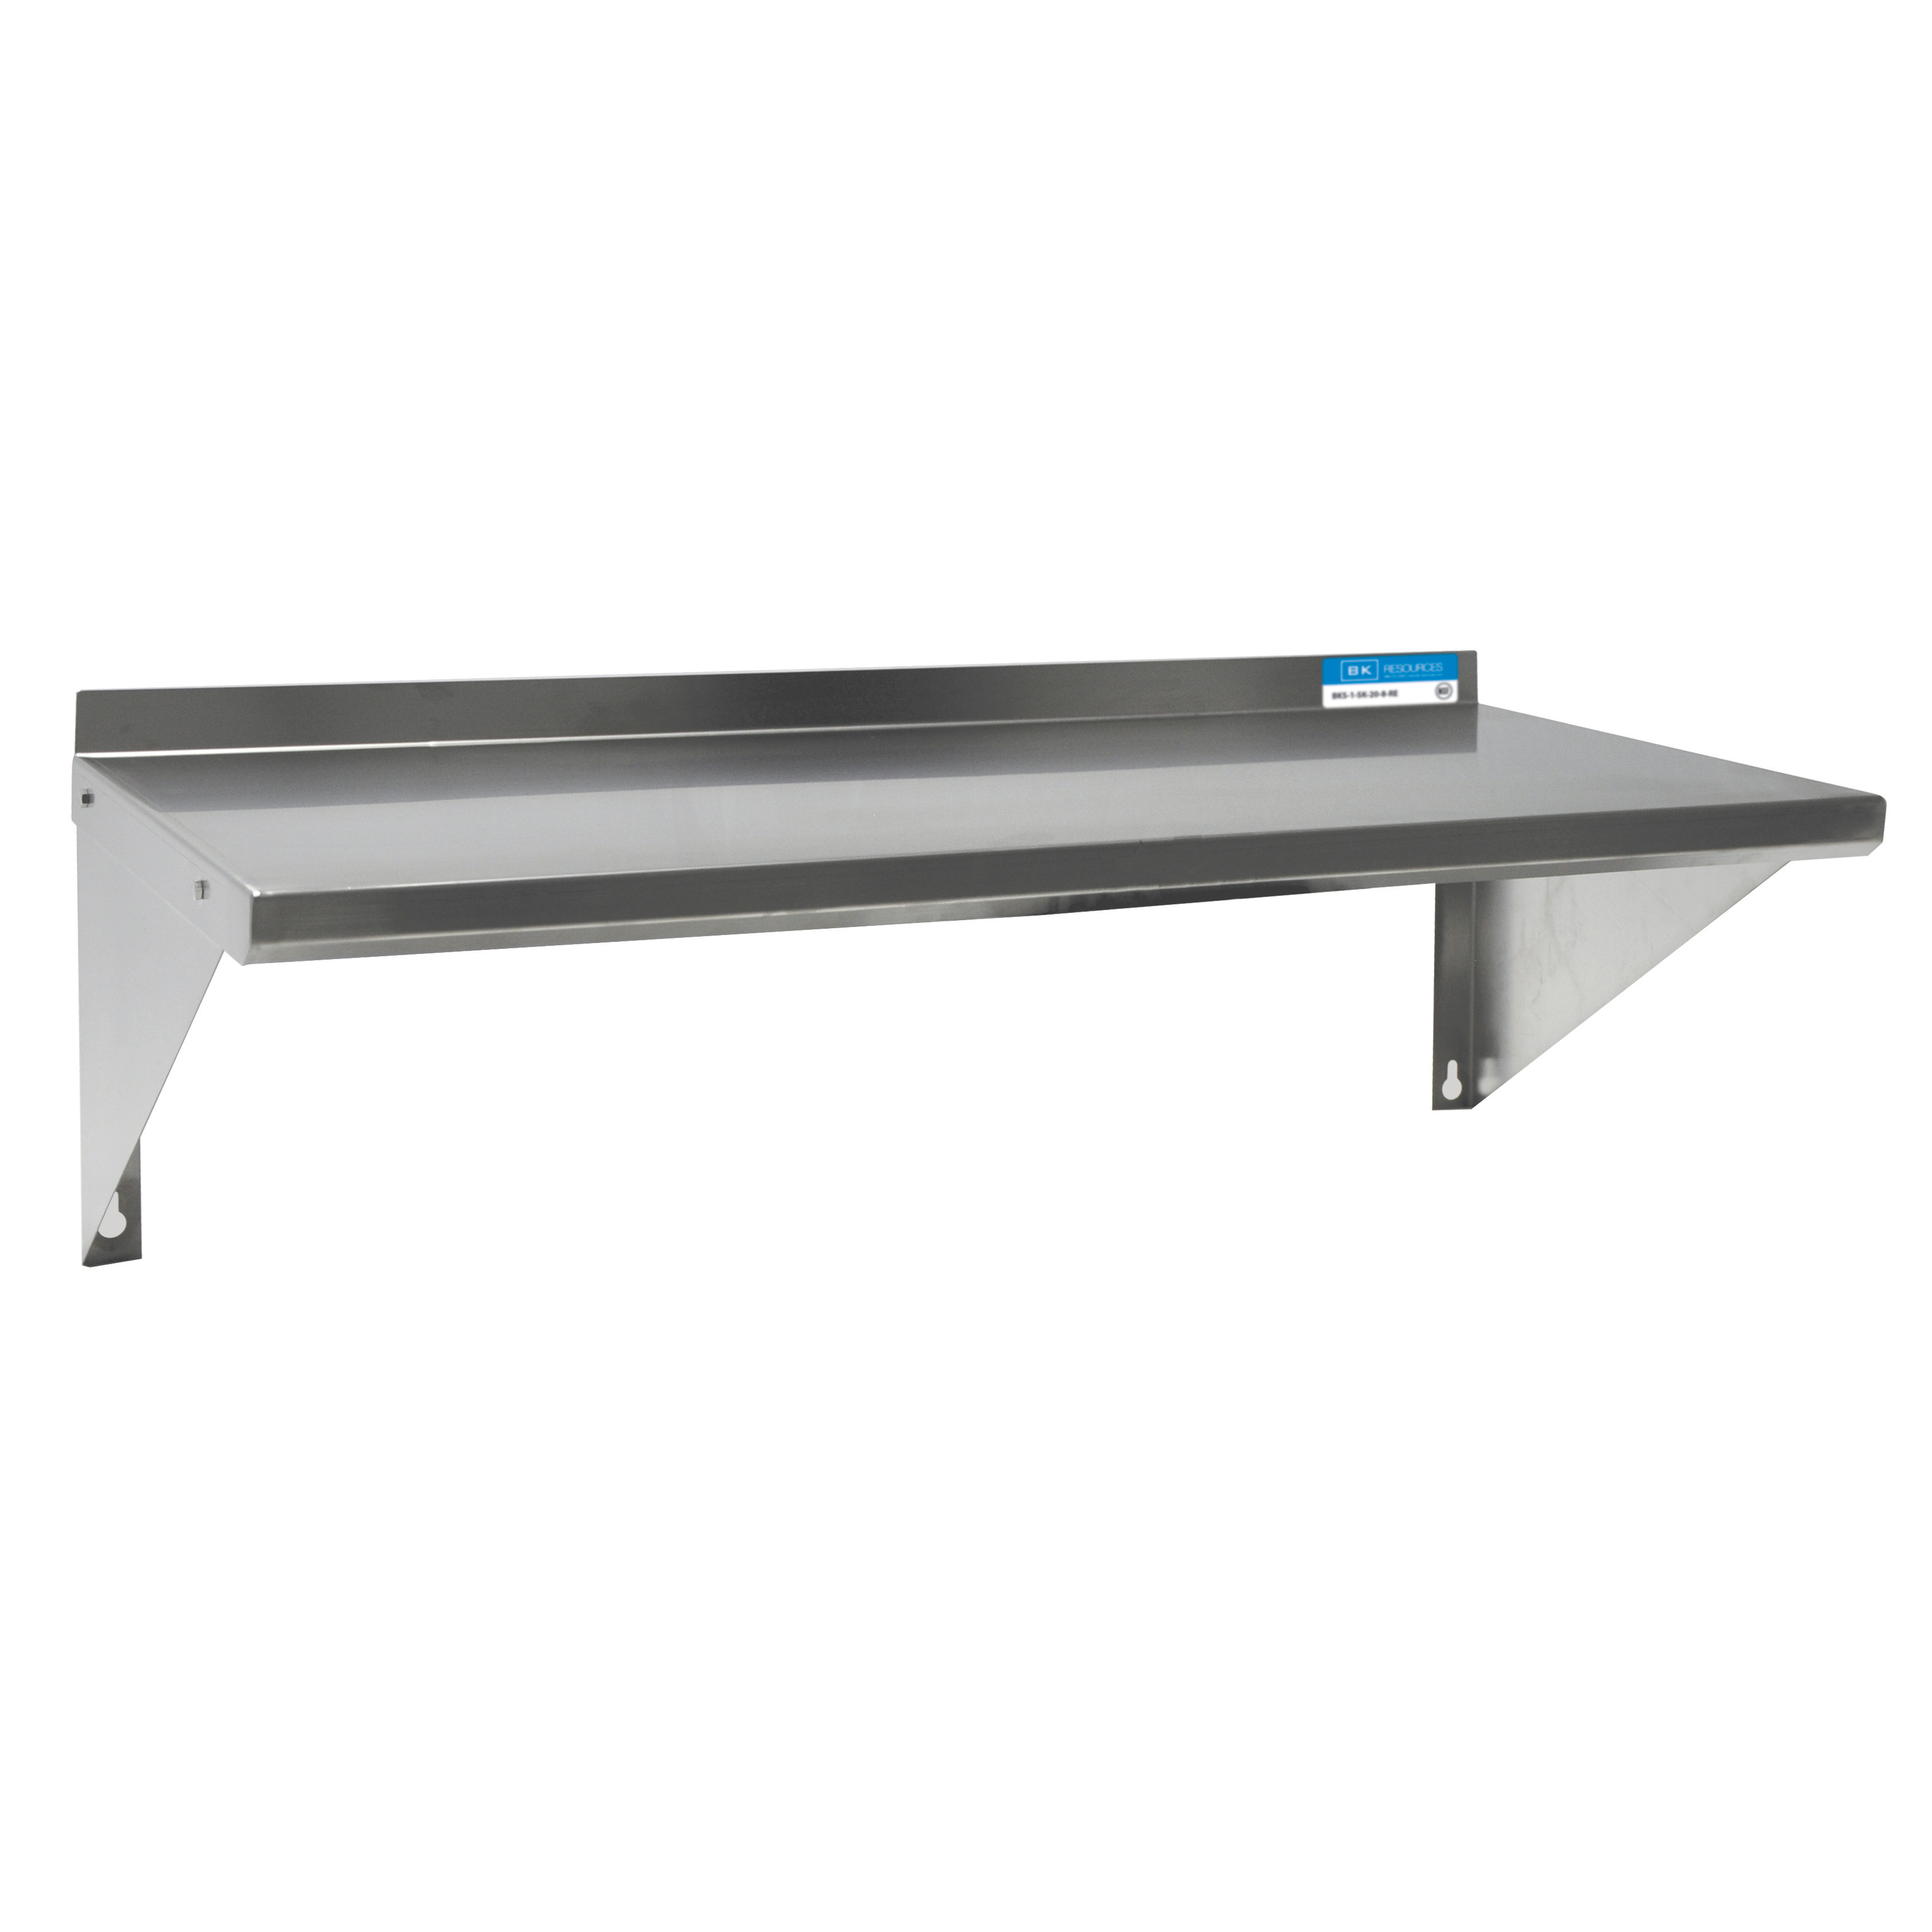 BK Resources BKWS6-1496 shelving, wall mounted